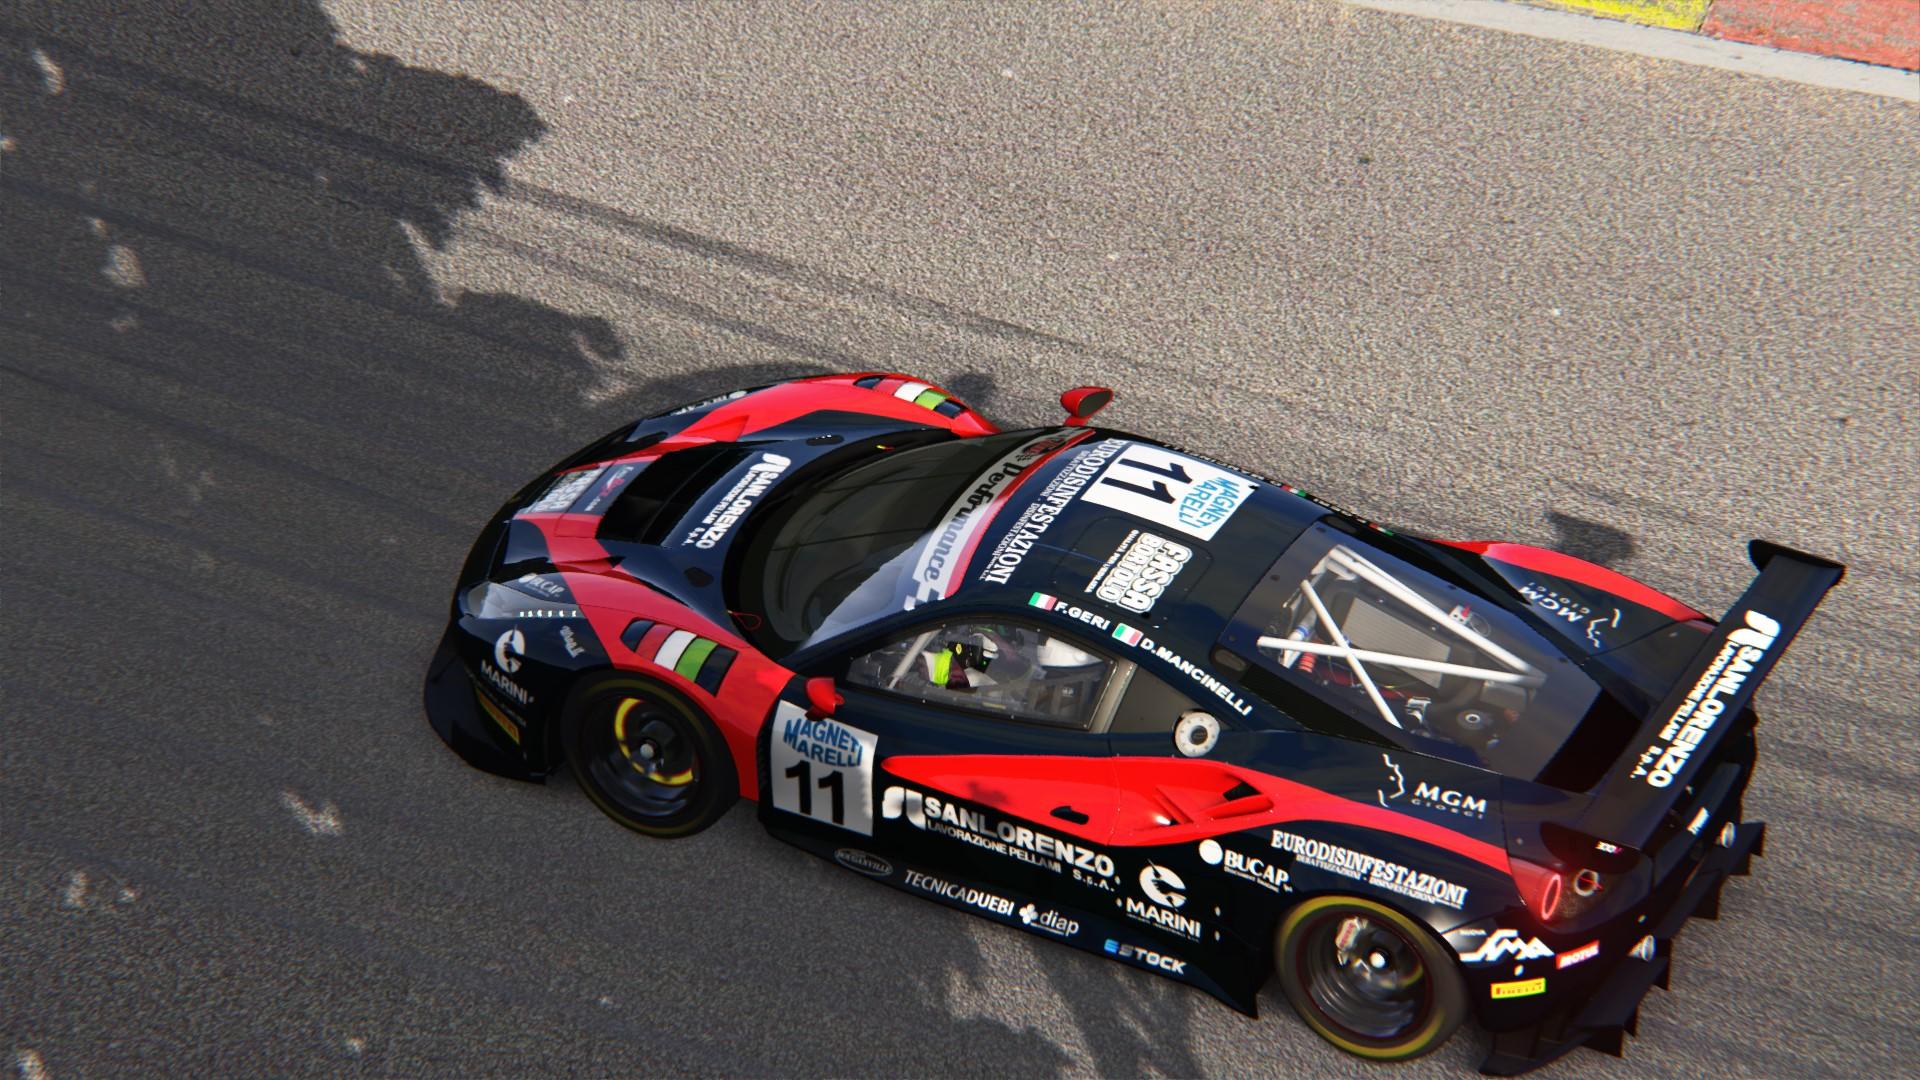 ferrari 488 gt3 easy race team 2016 racedepartment latest formula 1 motorsport and sim. Black Bedroom Furniture Sets. Home Design Ideas